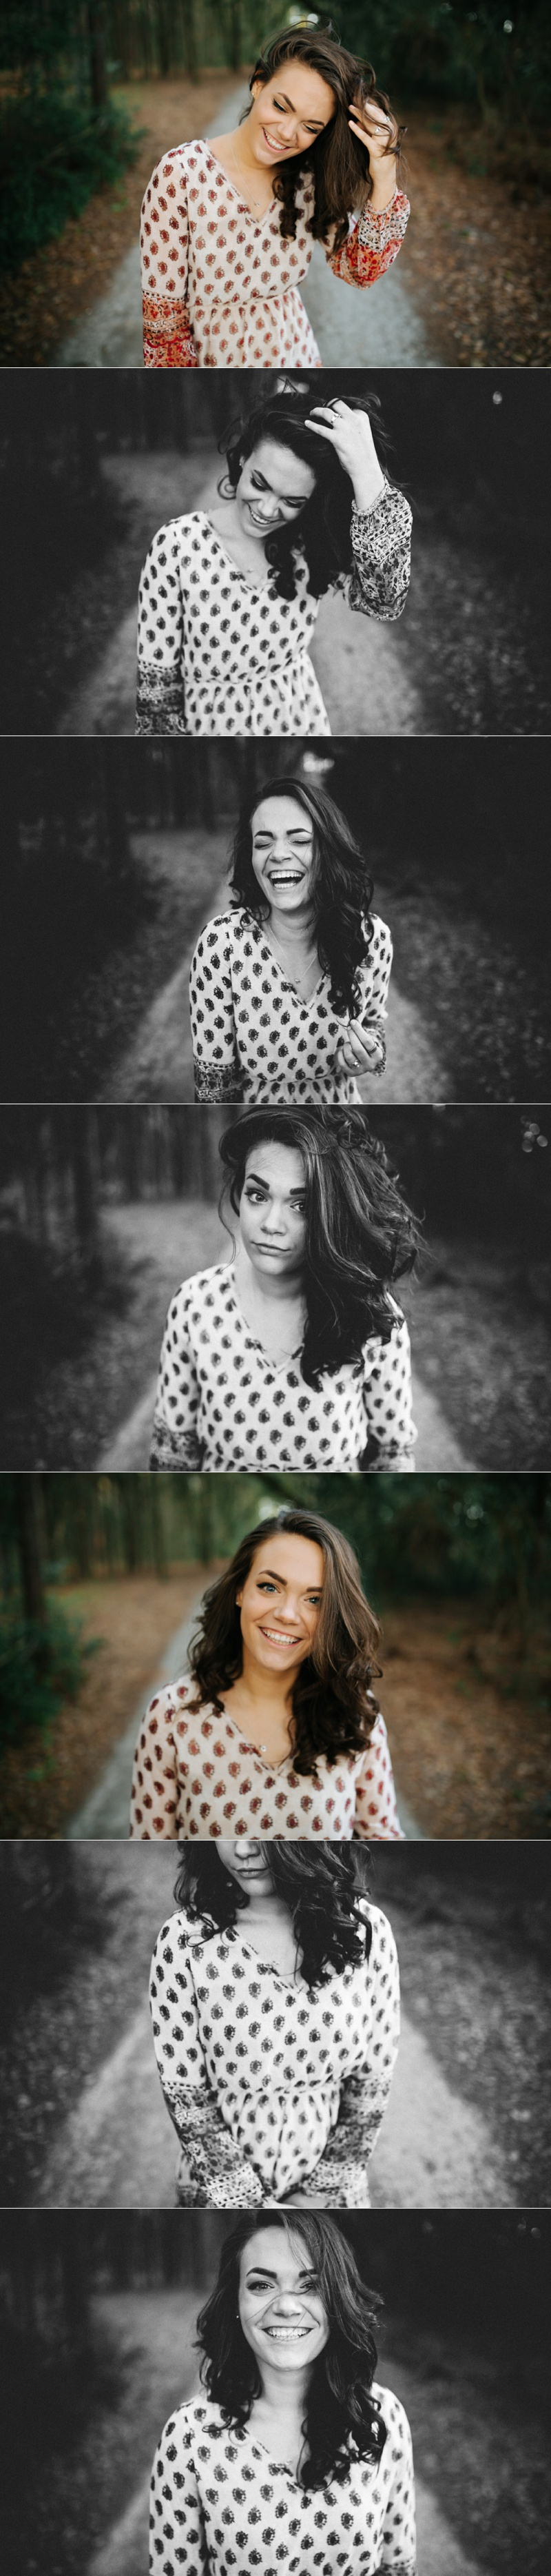 tampa woodsy senior portraits-6